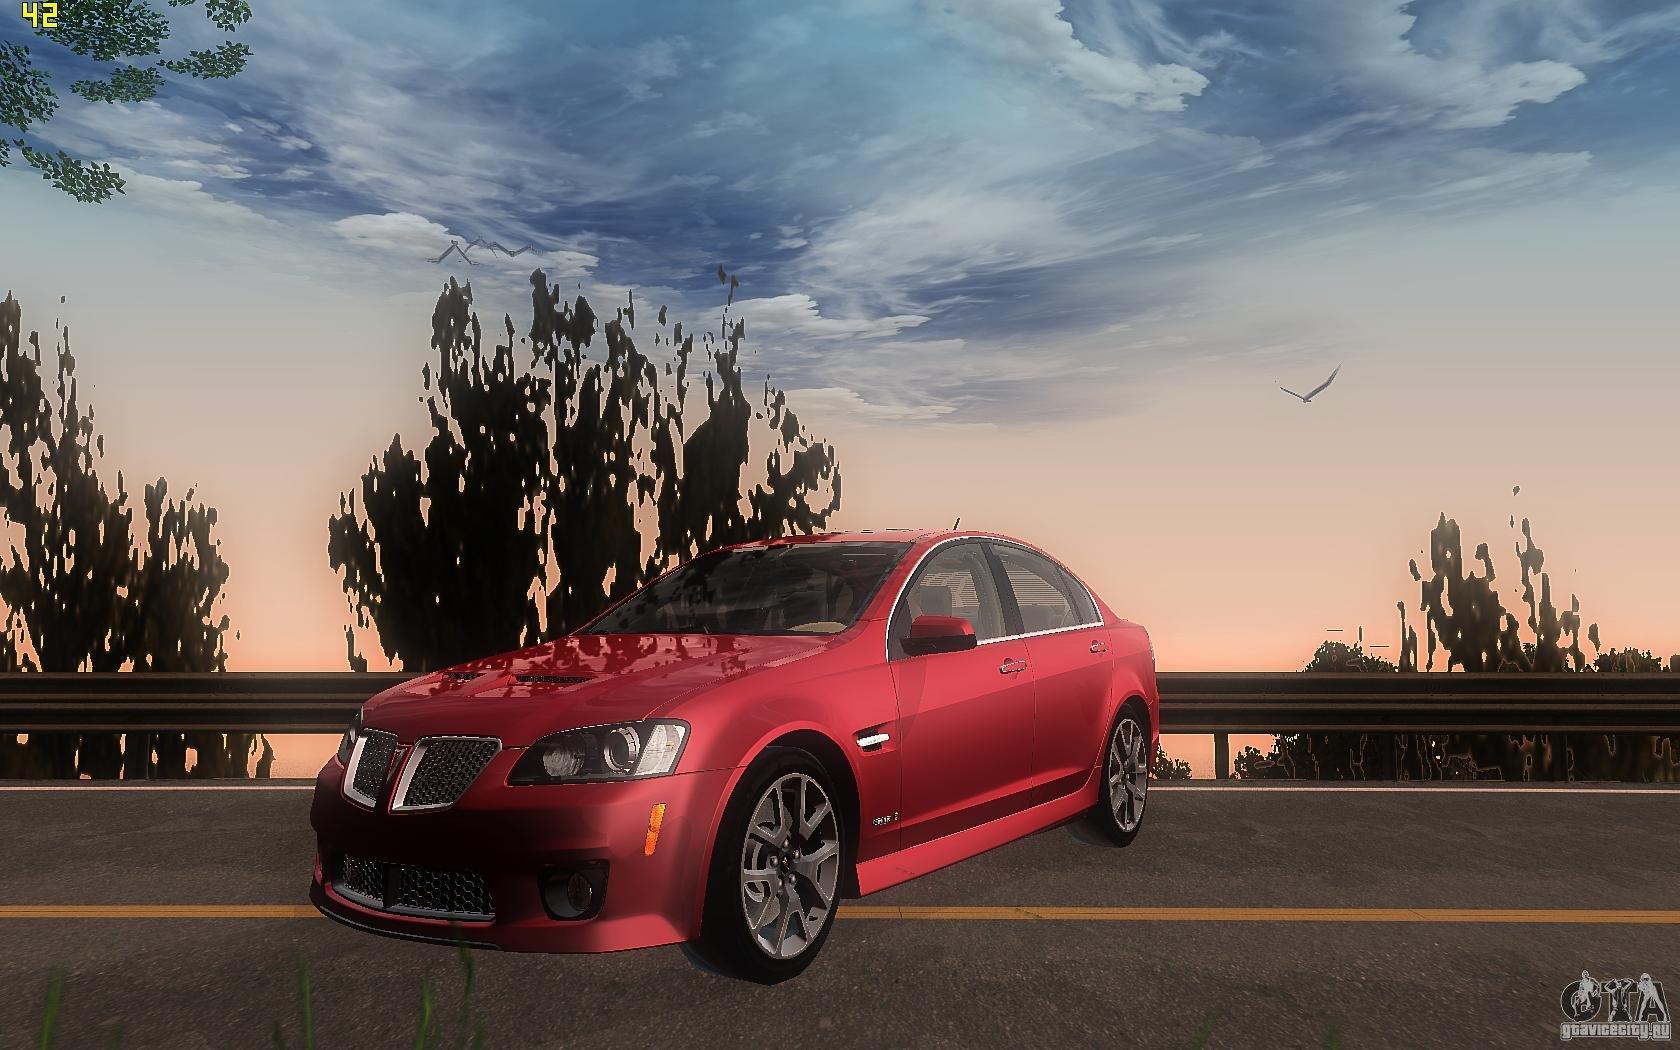 Pontiac G8 GXP - Grand Theft Auto: San Andreas